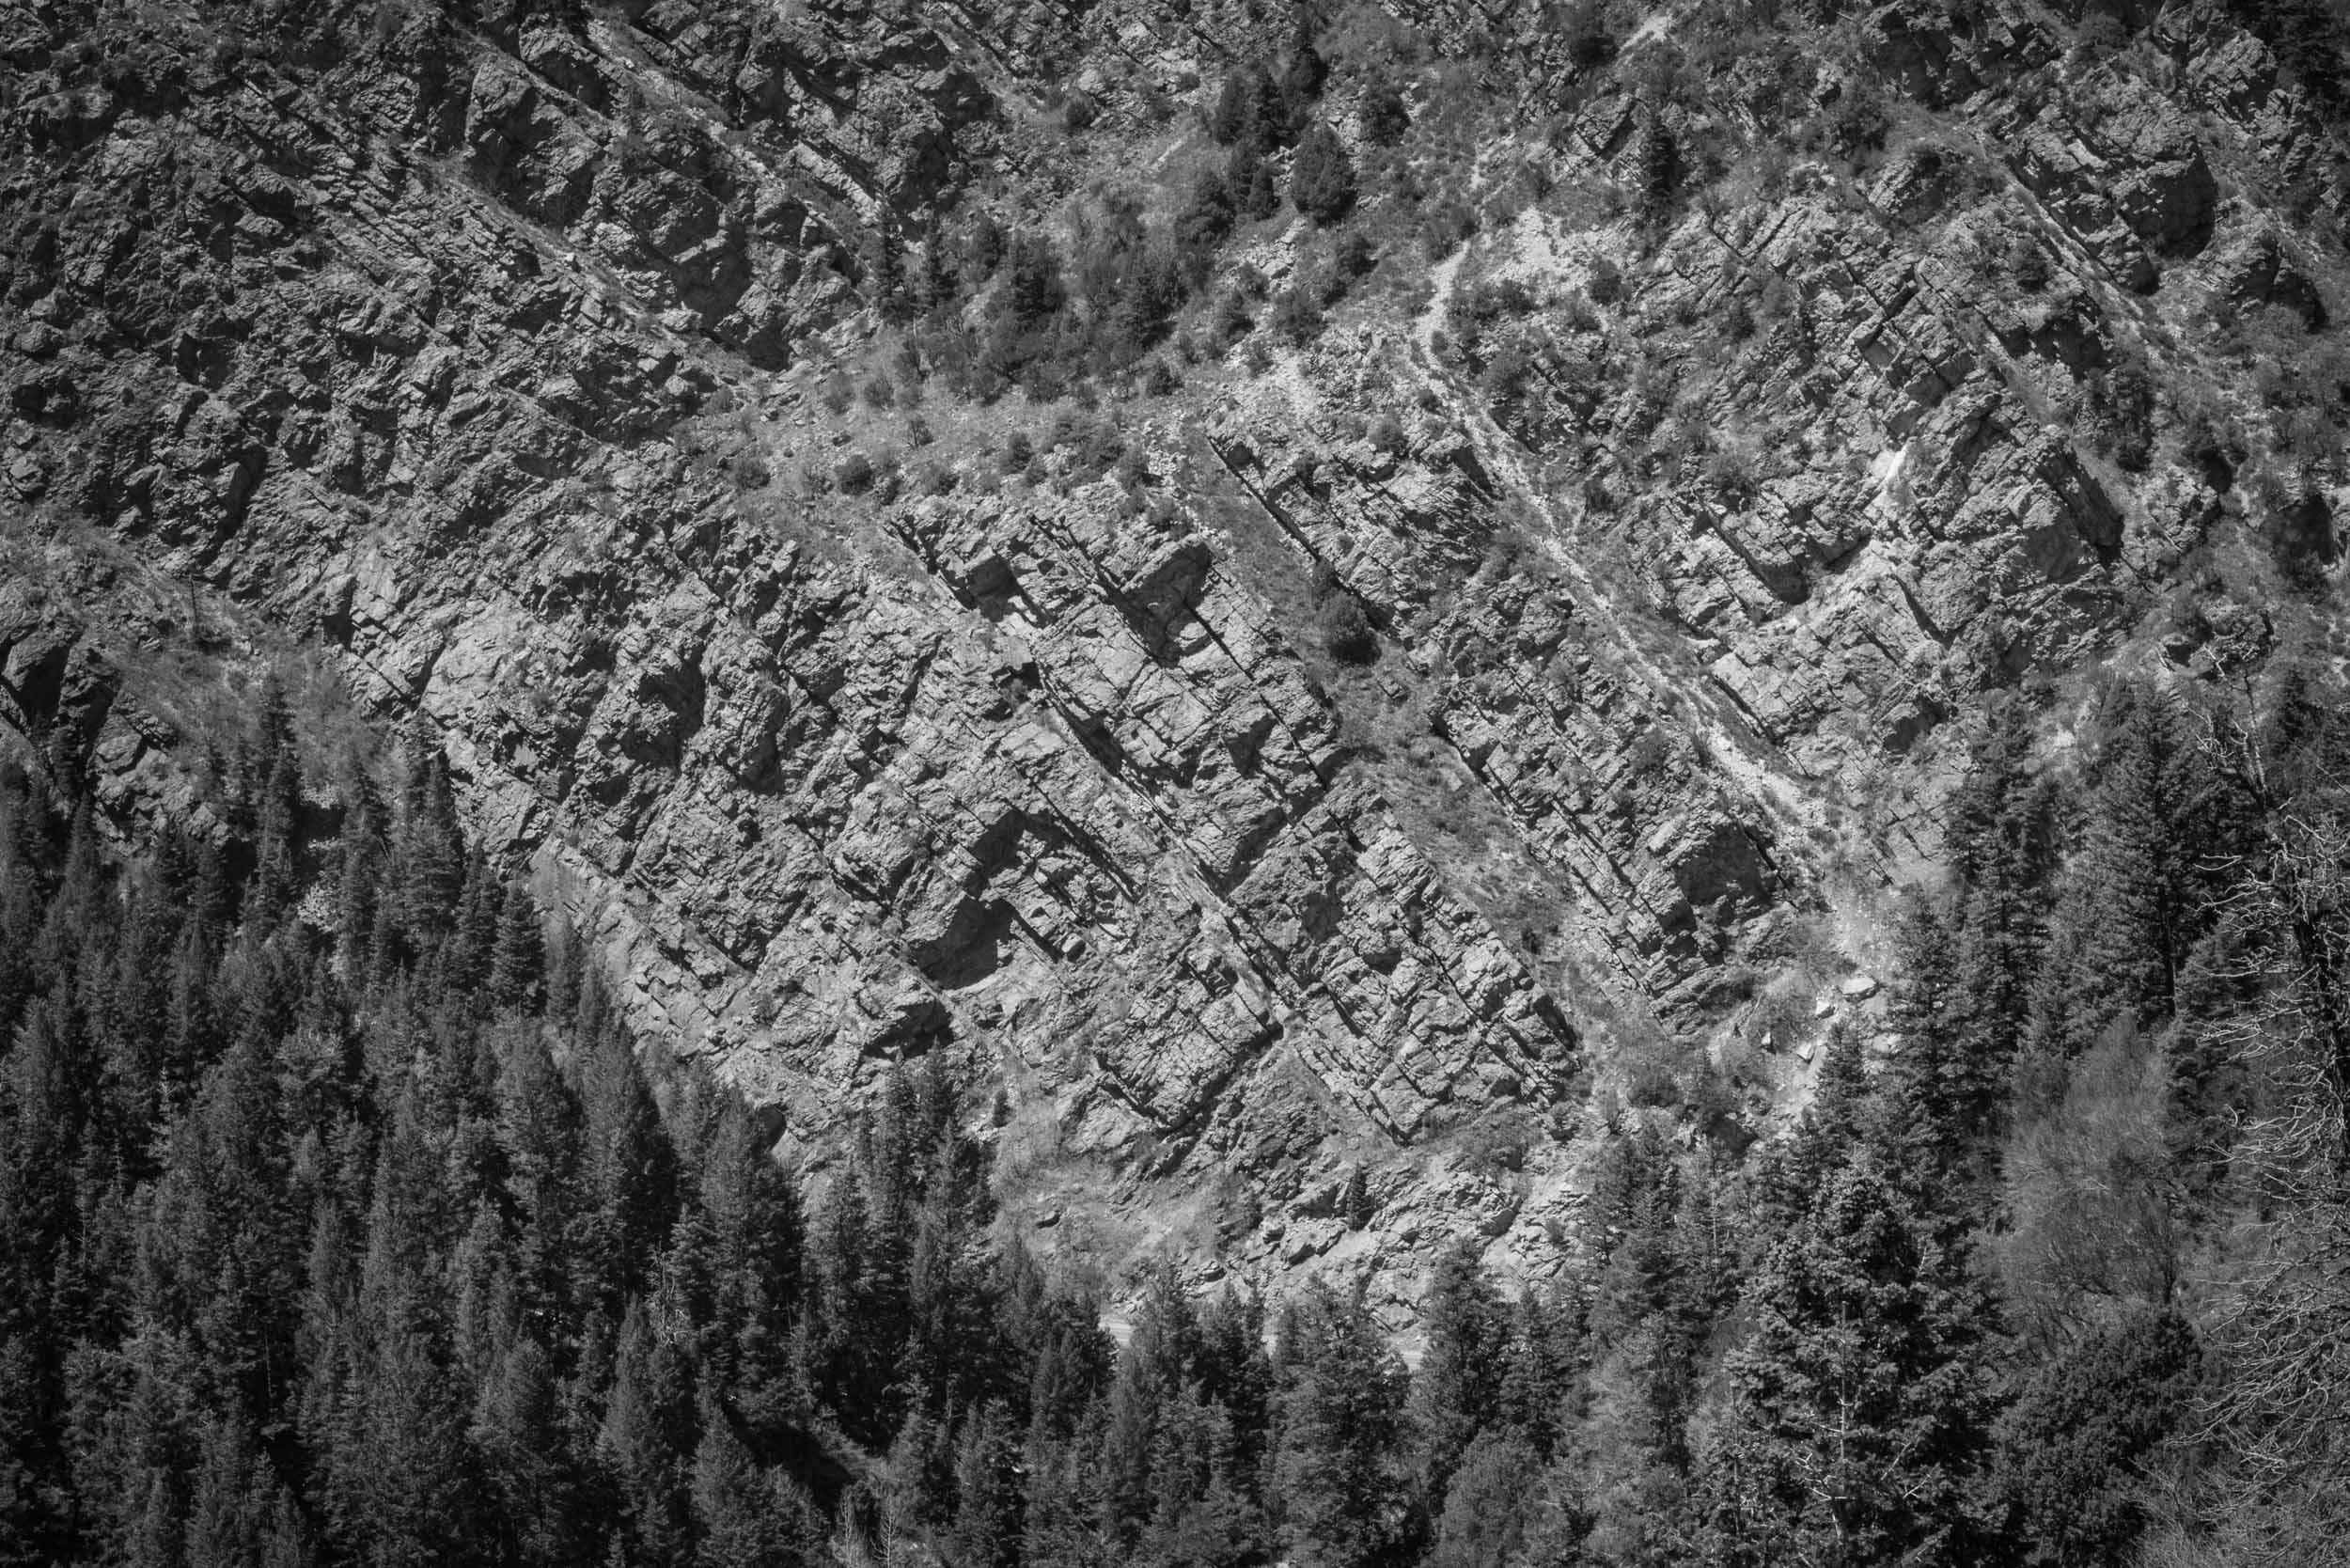 Big Cottonwood Canyon, Twin Peaks Wilderness, Wasatch Range, Utah.